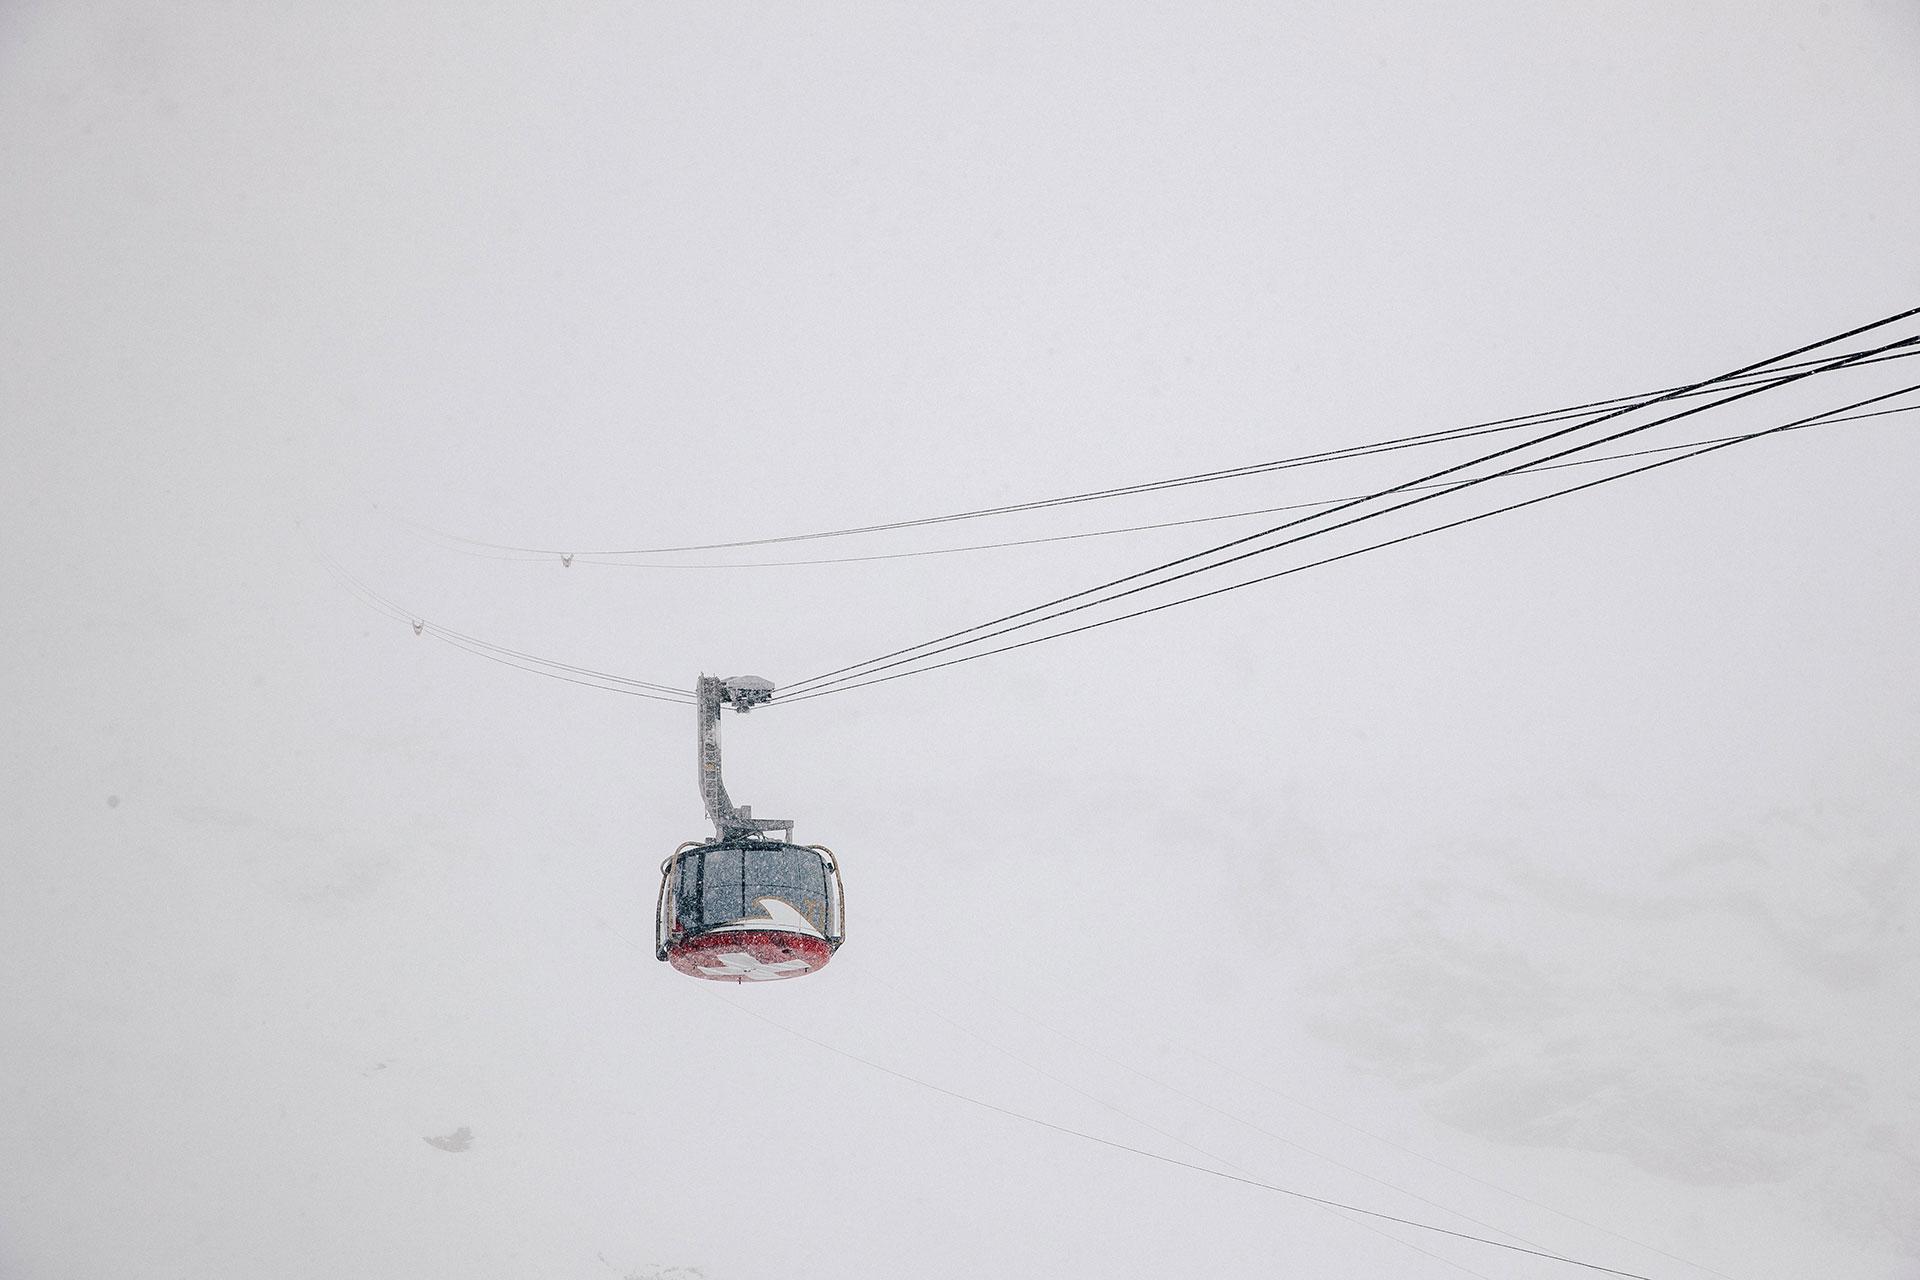 Seilbahn Fotograf Ski Alpin Winter Gondel Fotoproduktion Outdoor Michael Müller Hamburg